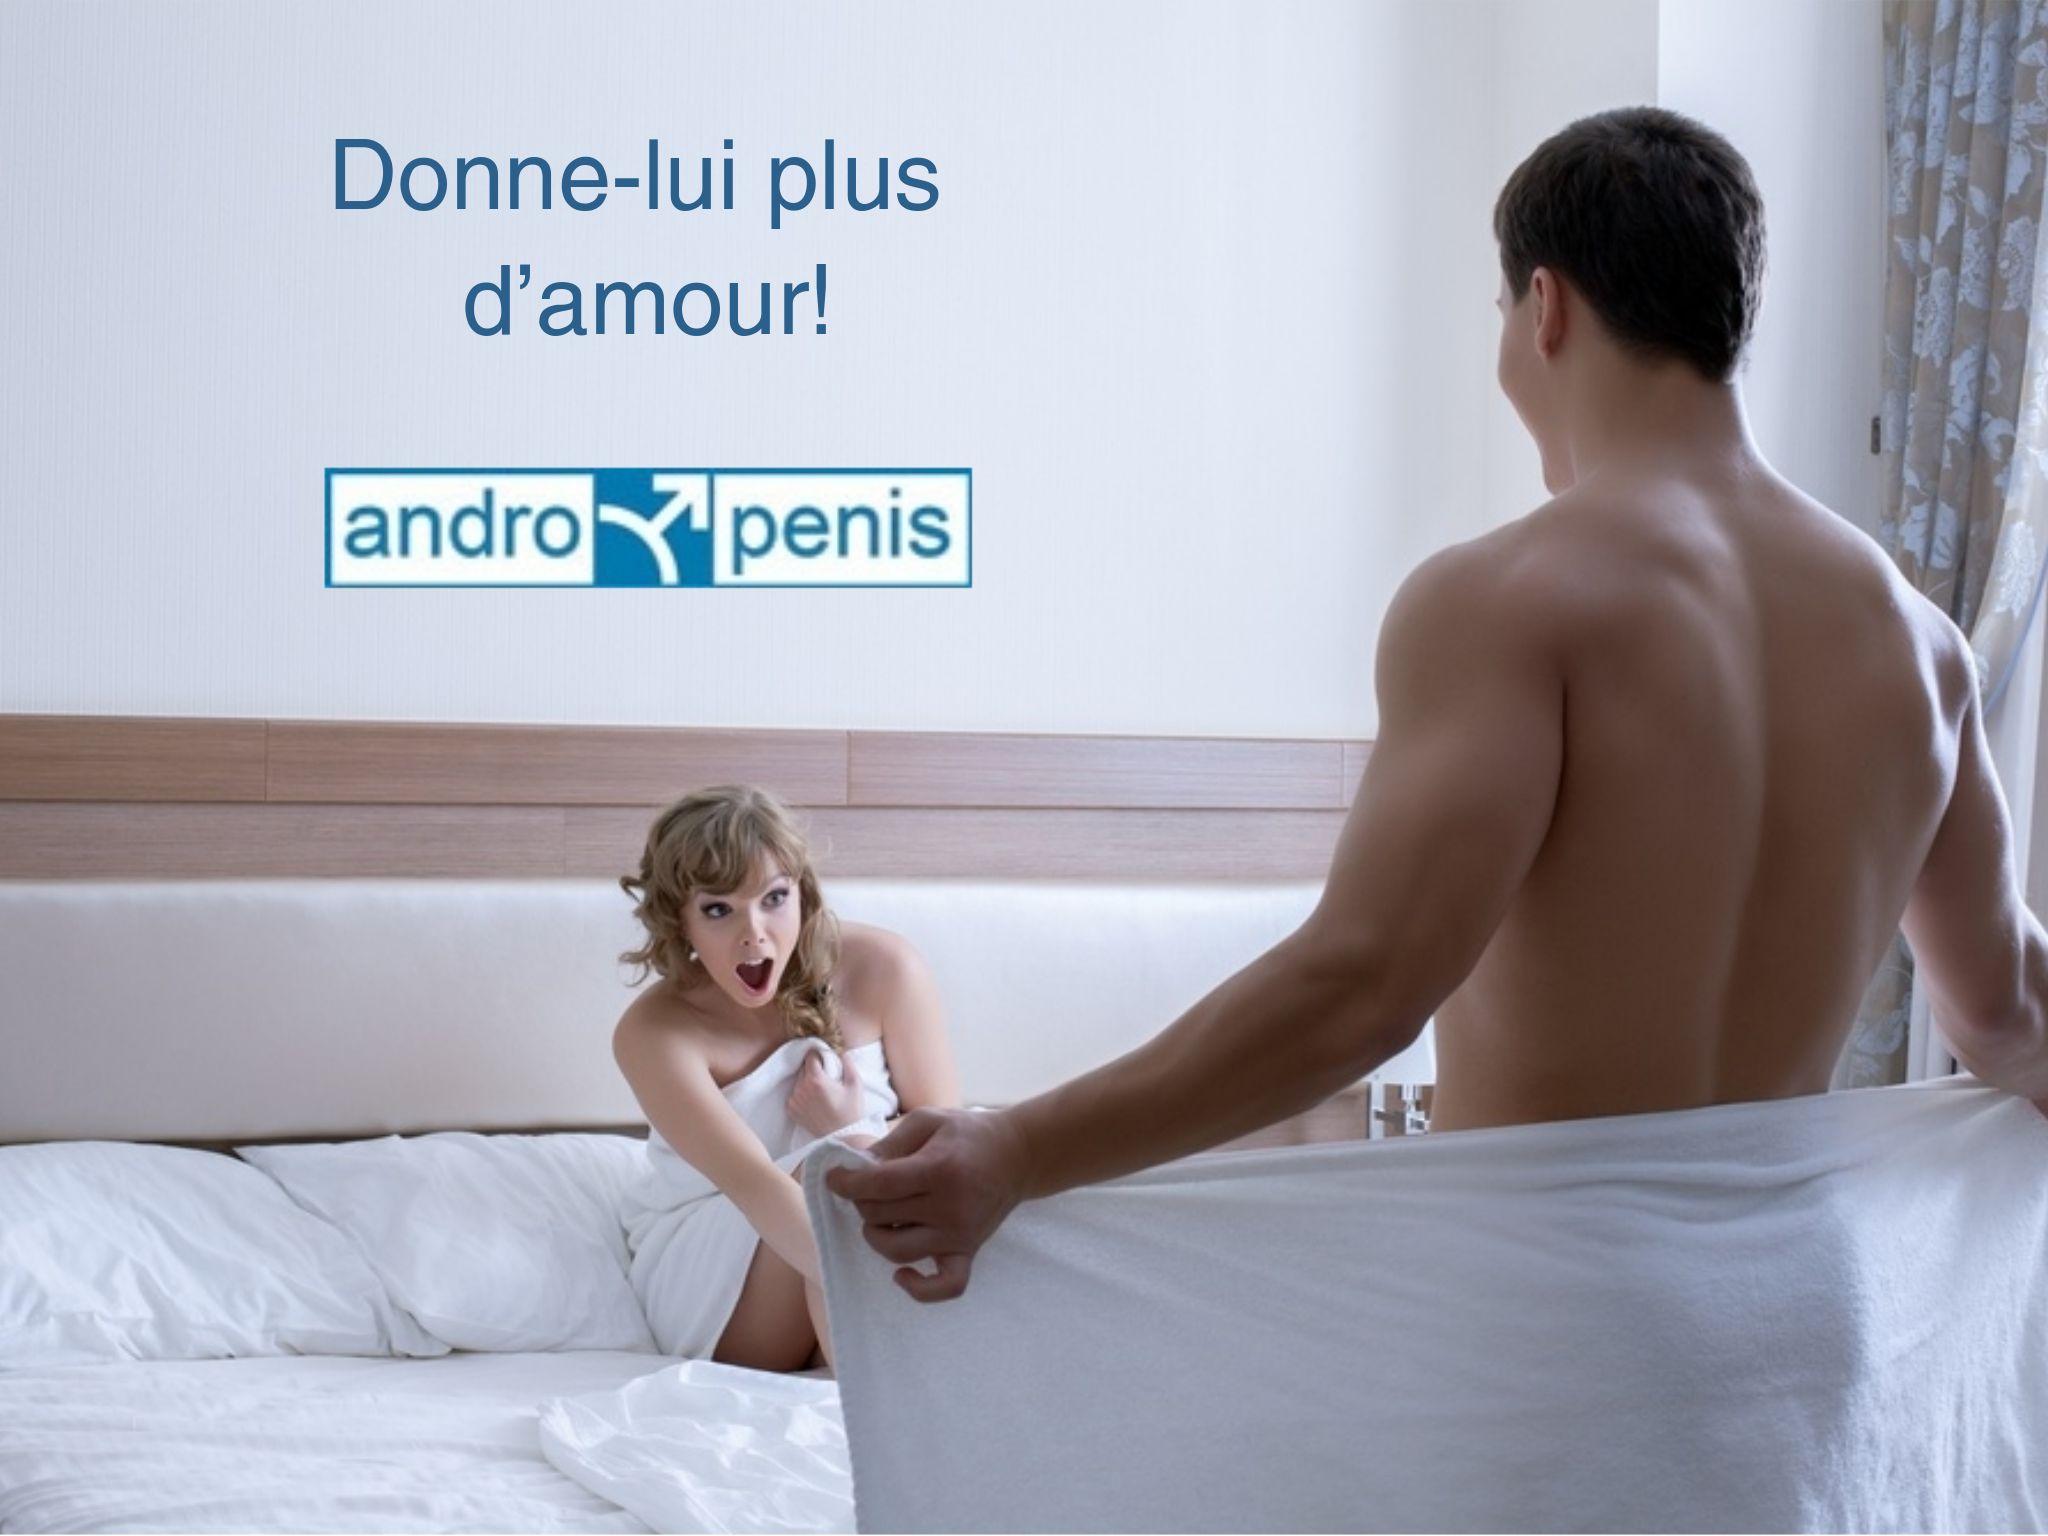 Andropenis Andropenis Permet Un Allongement Du Penis De Jusqu A 4